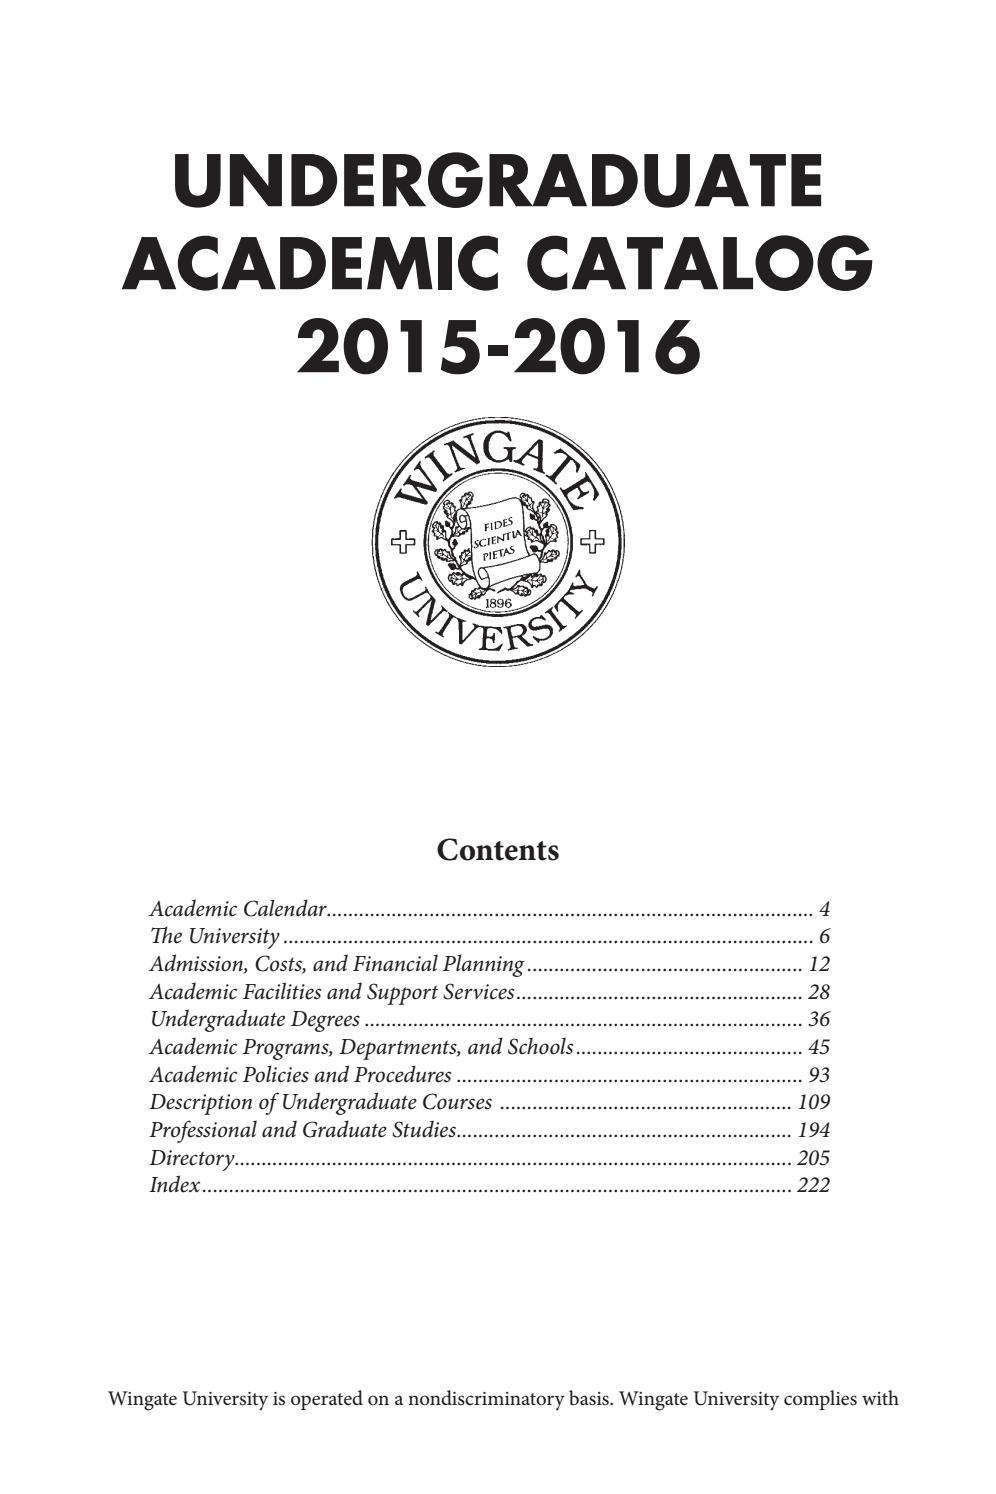 2015 16 Undergraduate Catalogwingate University - Issuu Throughout Delaware State University Academic Calendar